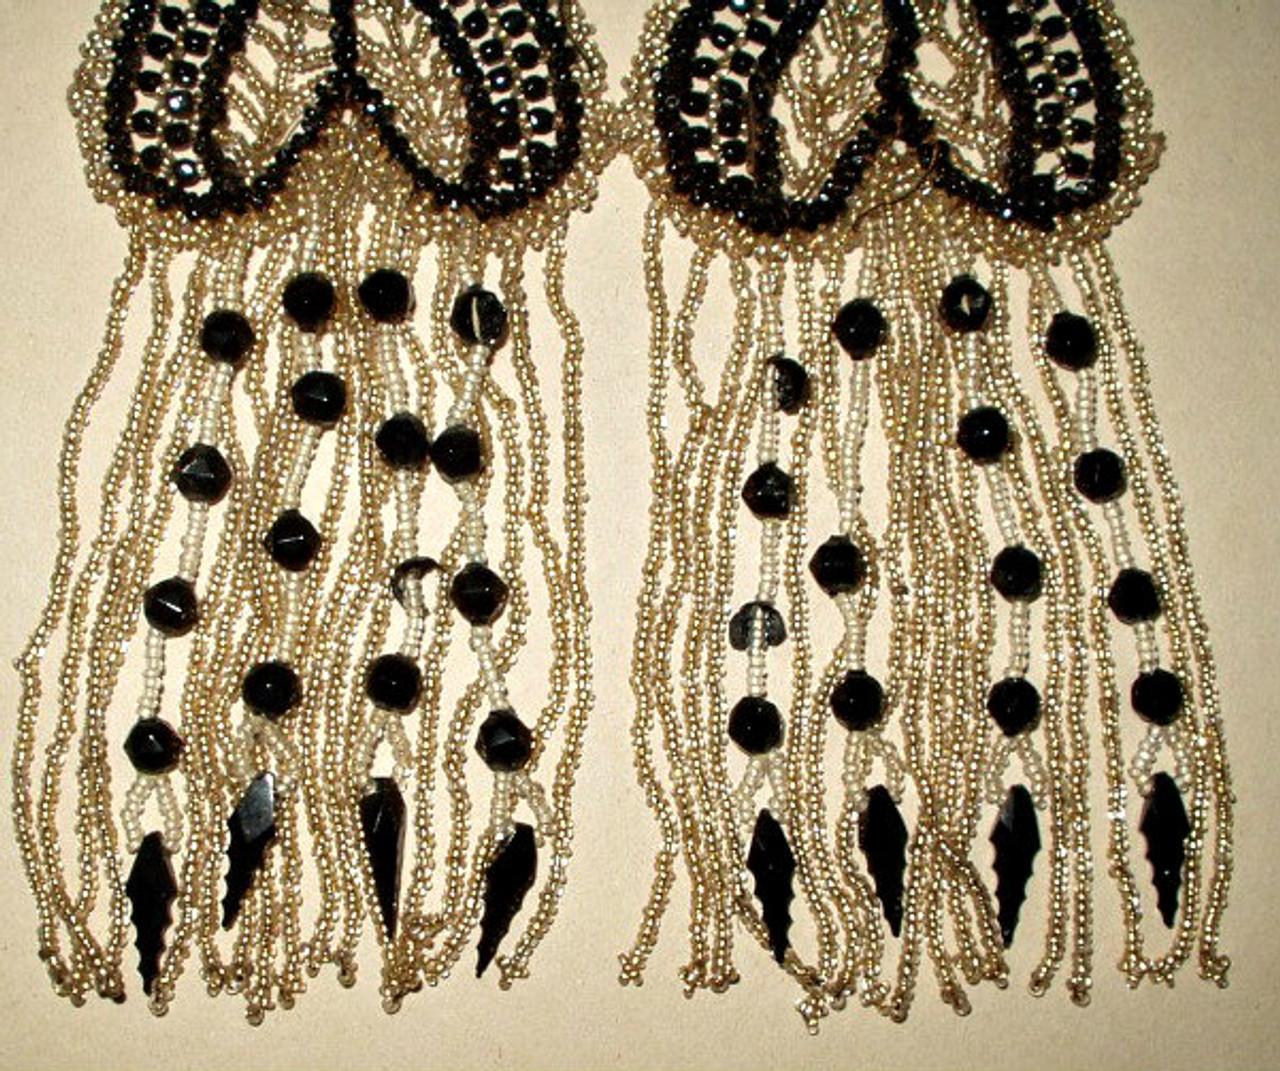 Antique Edwardian 1920's French Beaded  Dress Embellishment Trim